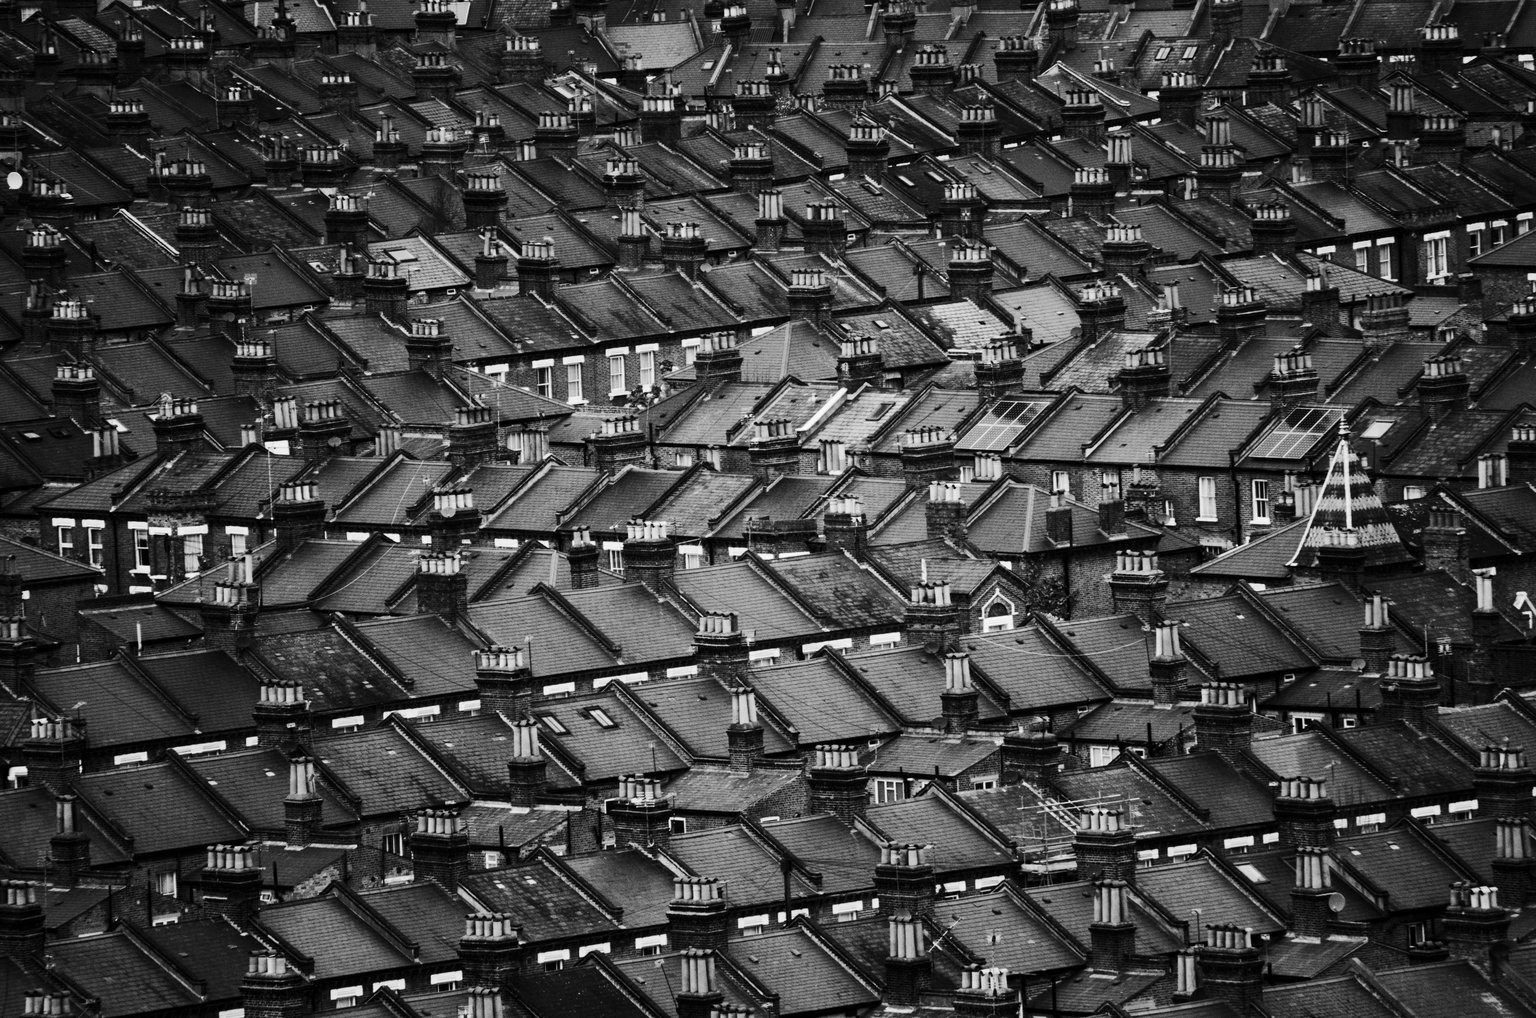 2017-07-16_596b73434a3c5_LondonRooftops-CharlesBrabin.jpg